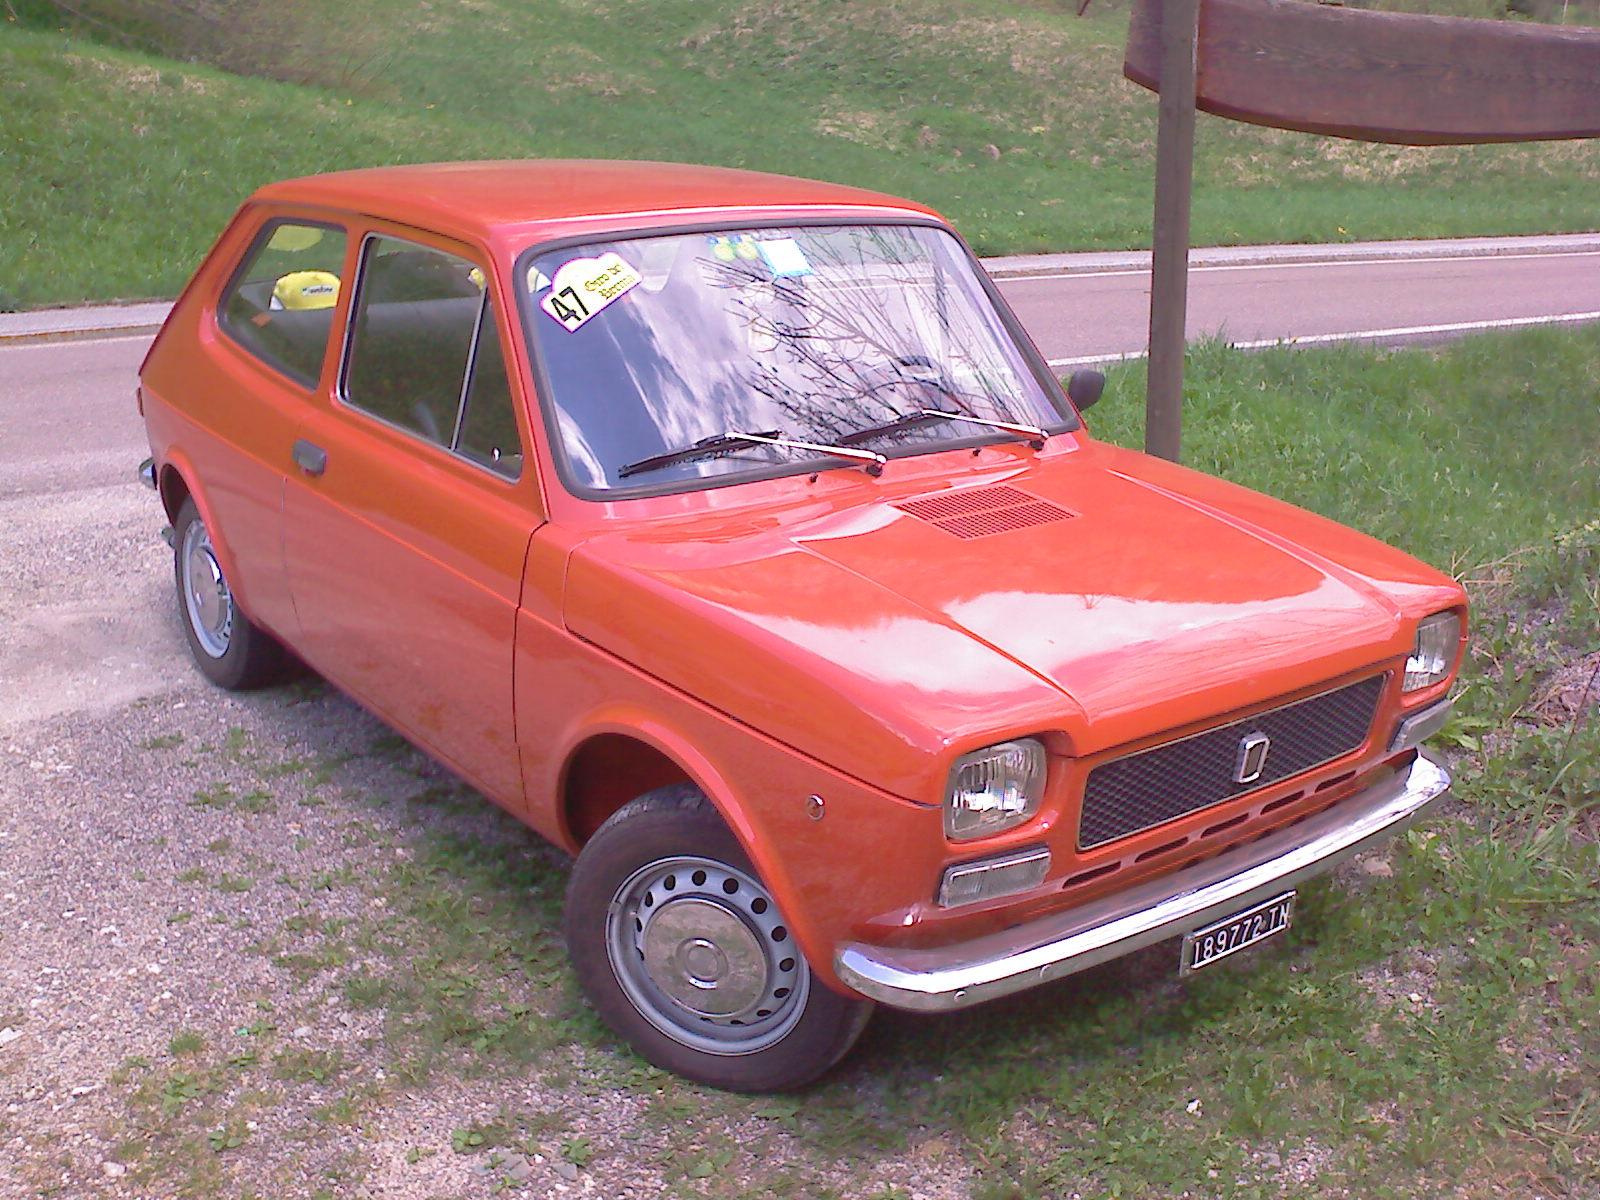 Fiat 127 Wikipedia Wiring Diagram For 1973 850 Spyder